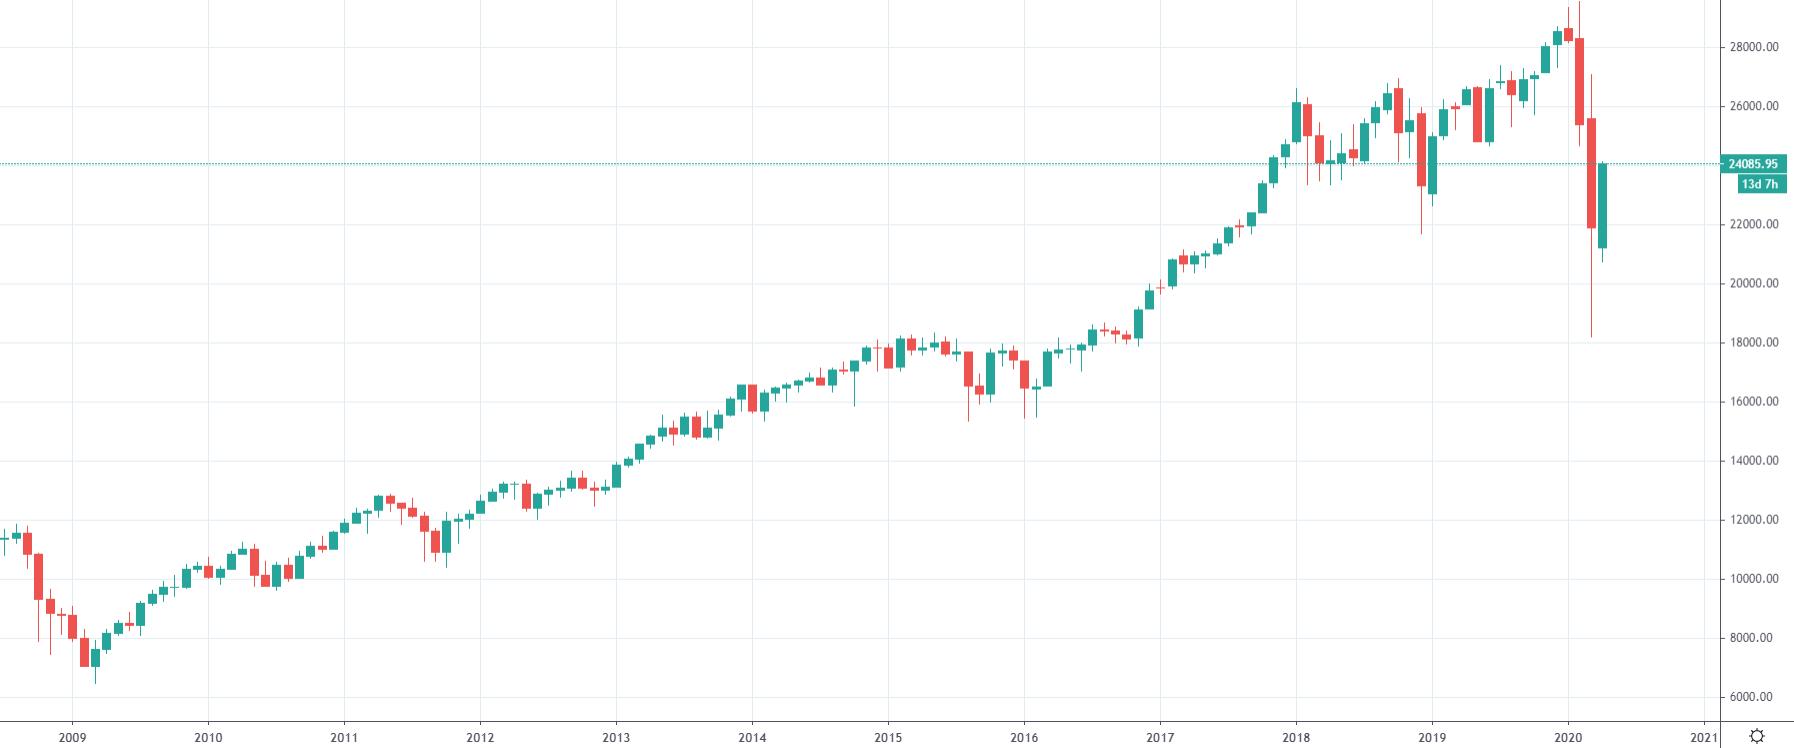 Graf indexu Dow Jones